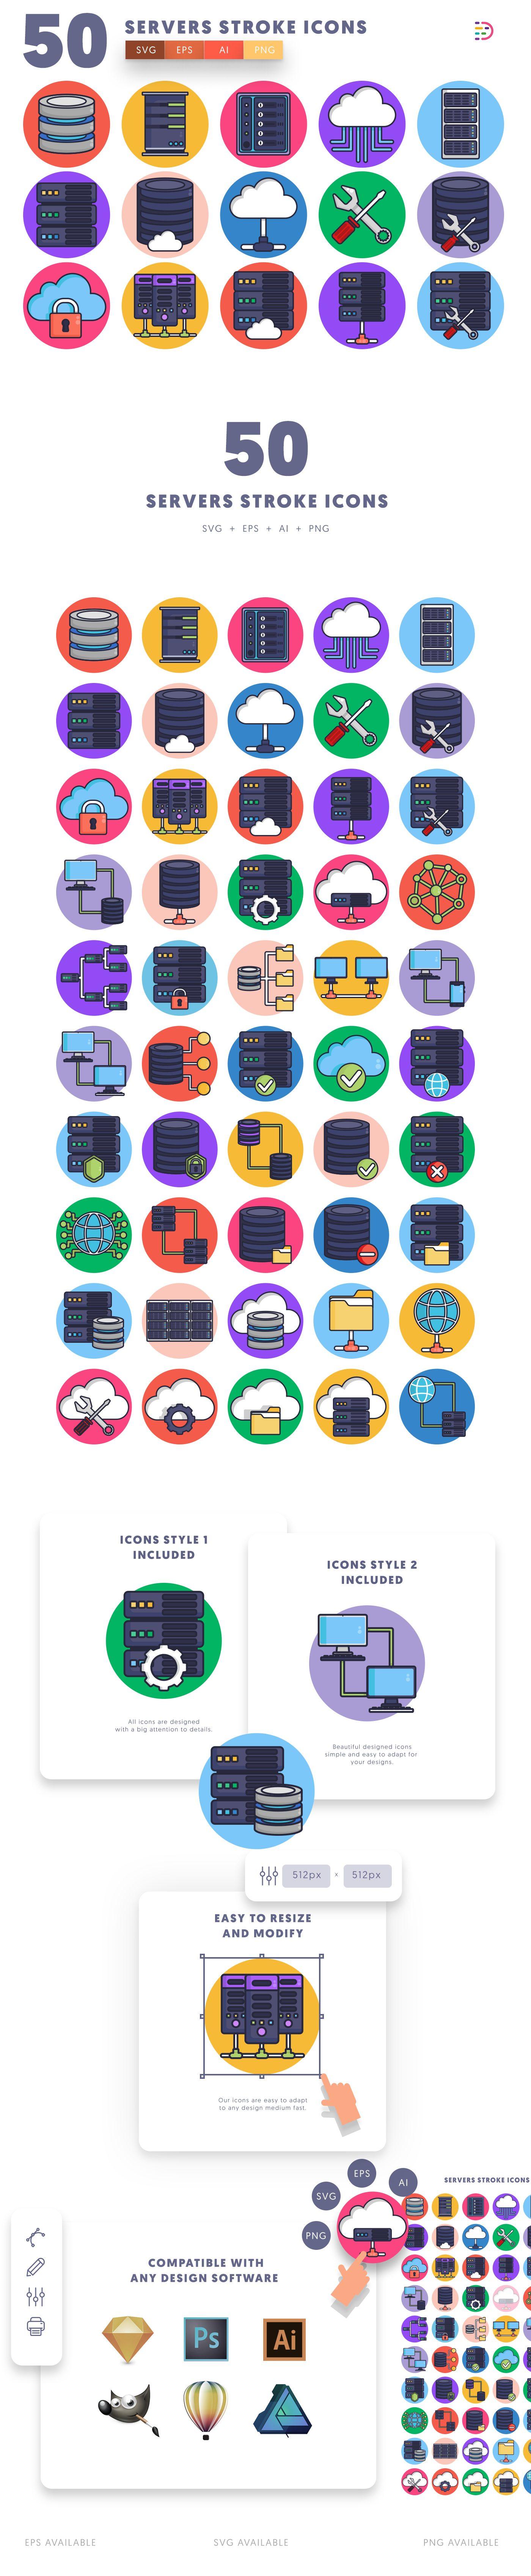 Servers Stroke icons info graphic